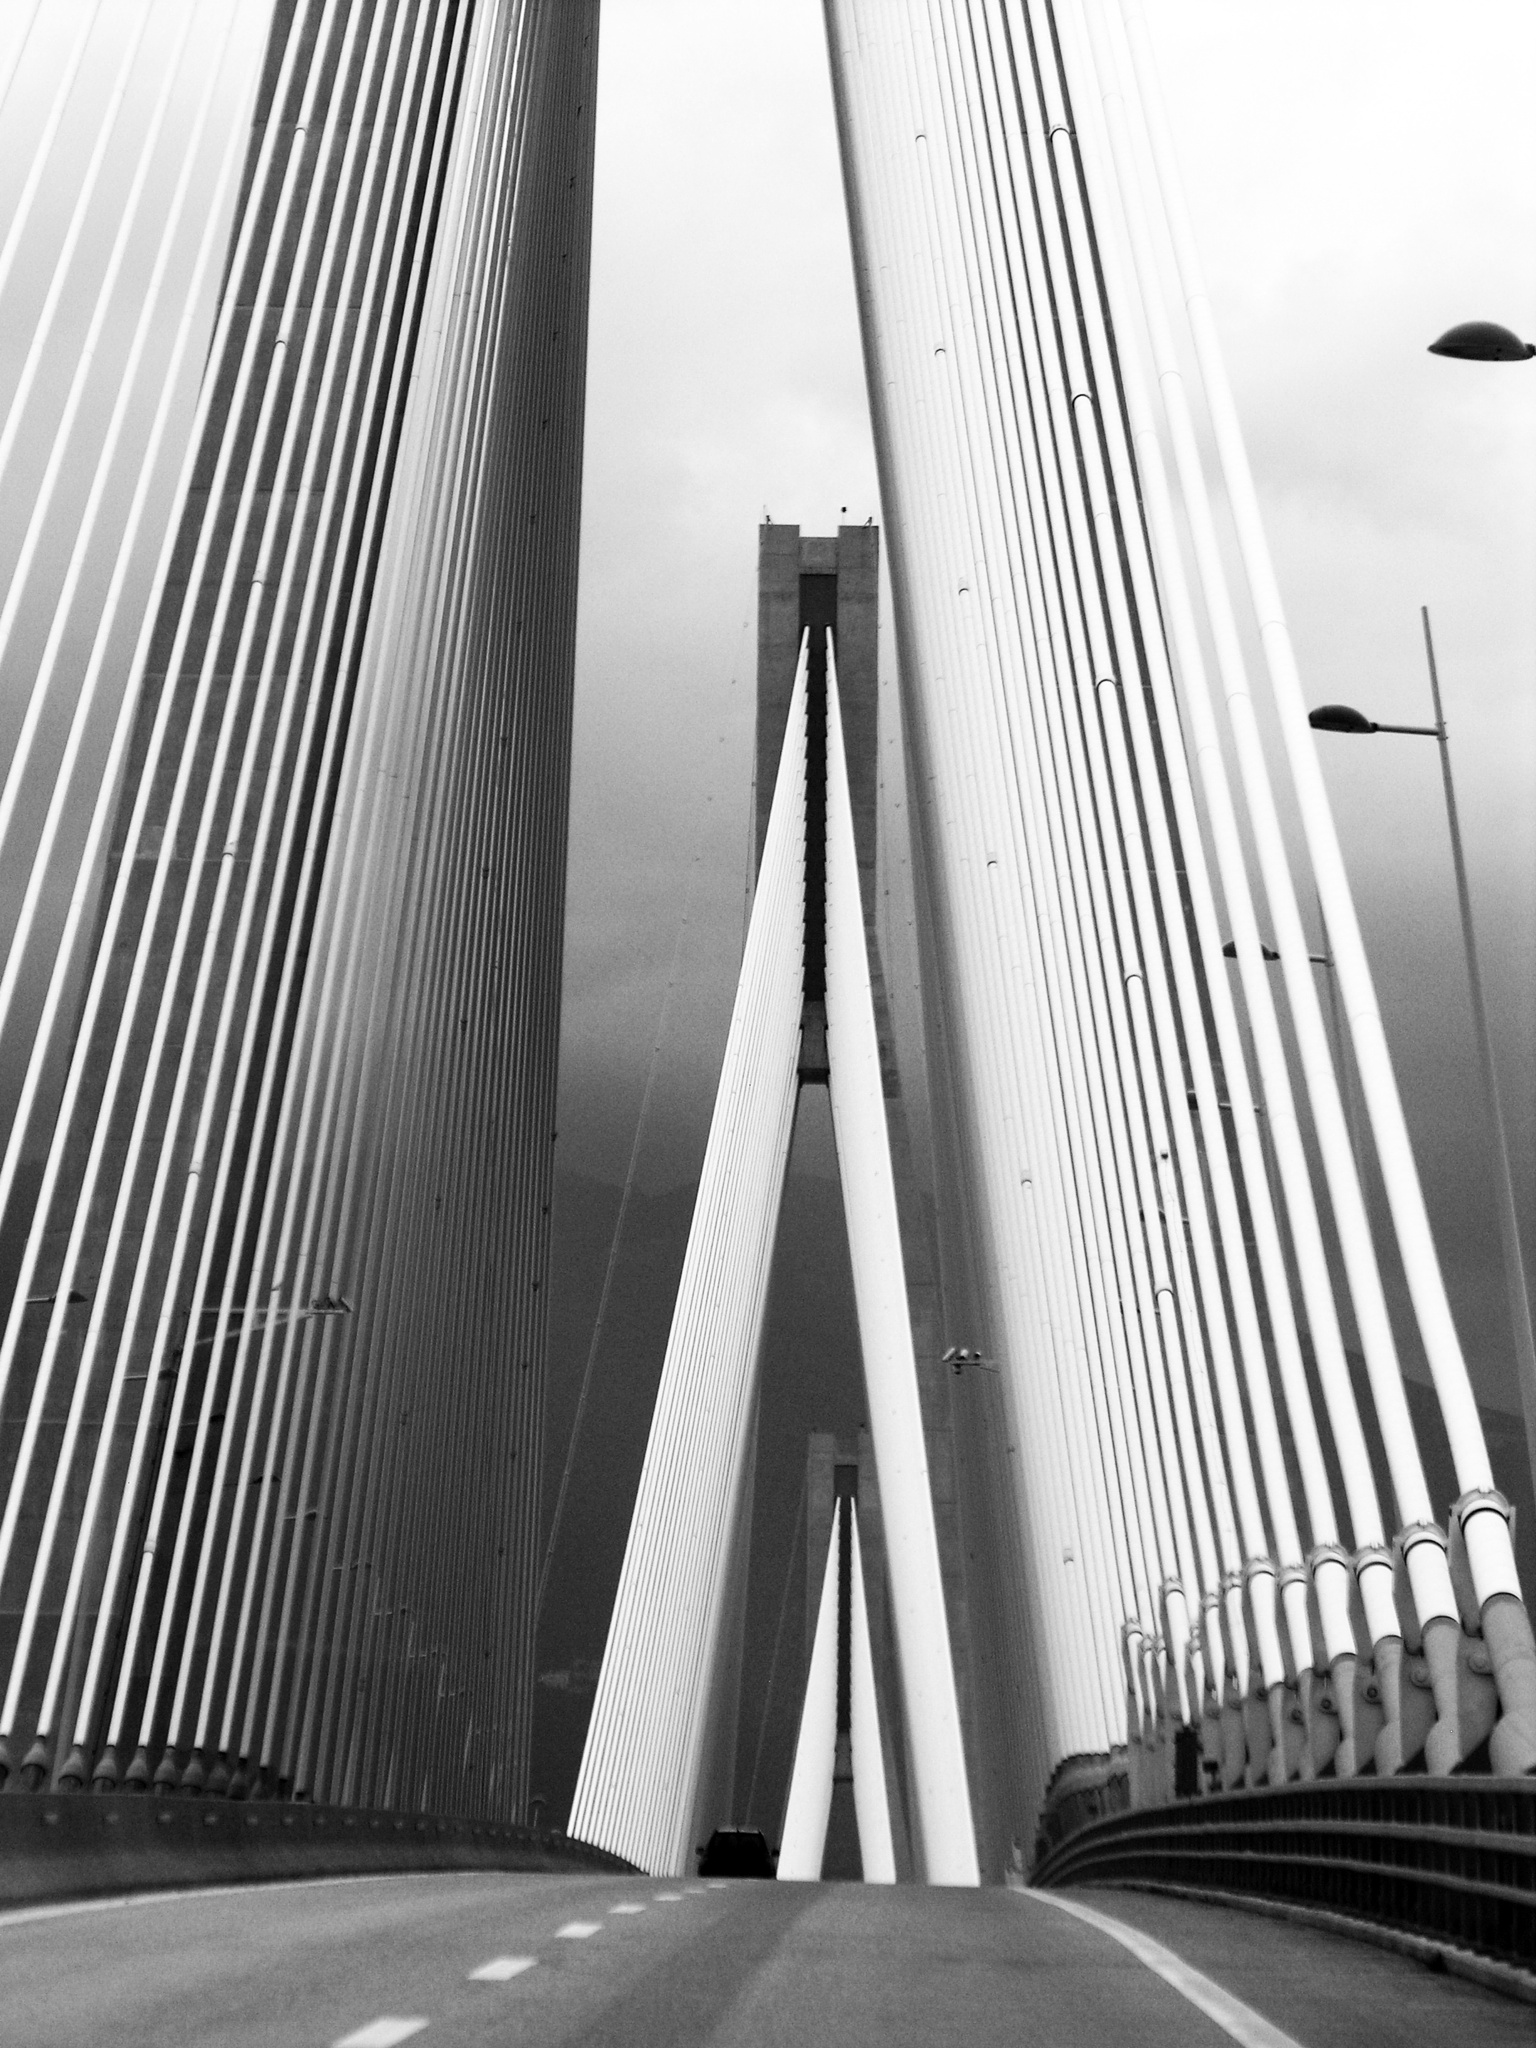 Bridge over the Gulf of Korinth by Fabio Dal Barco